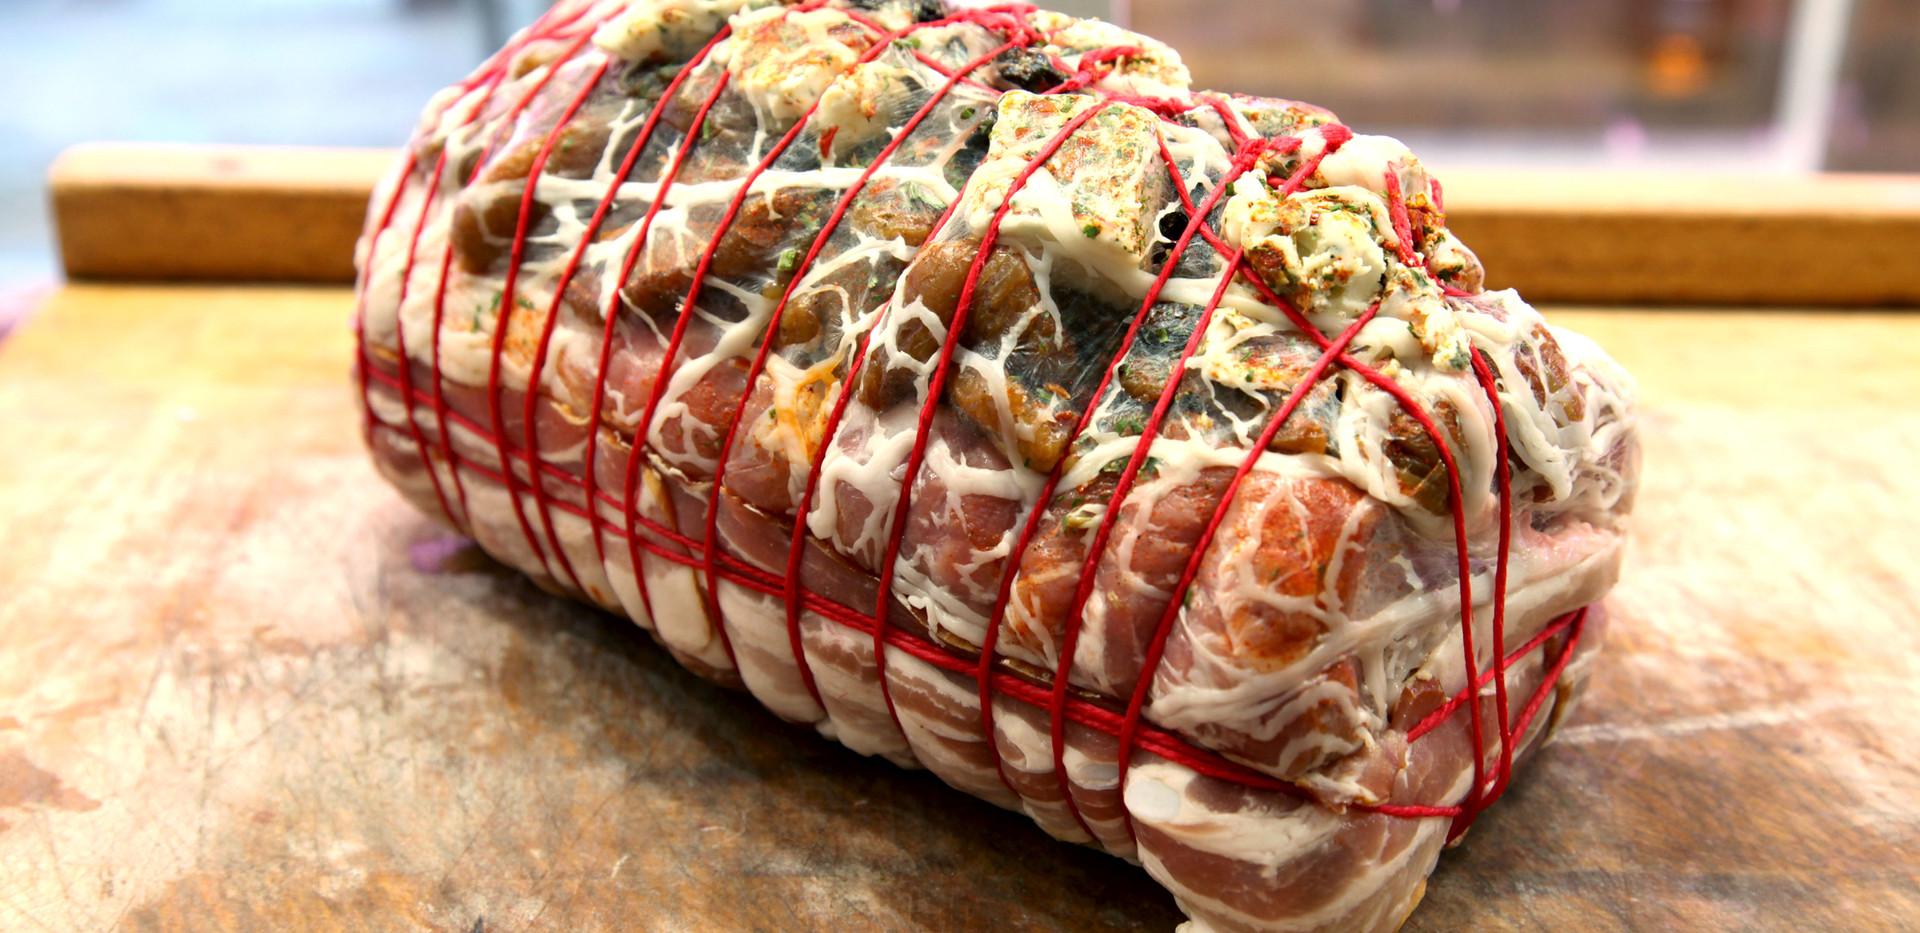 Rôti de Porc au Roquefort.jpg